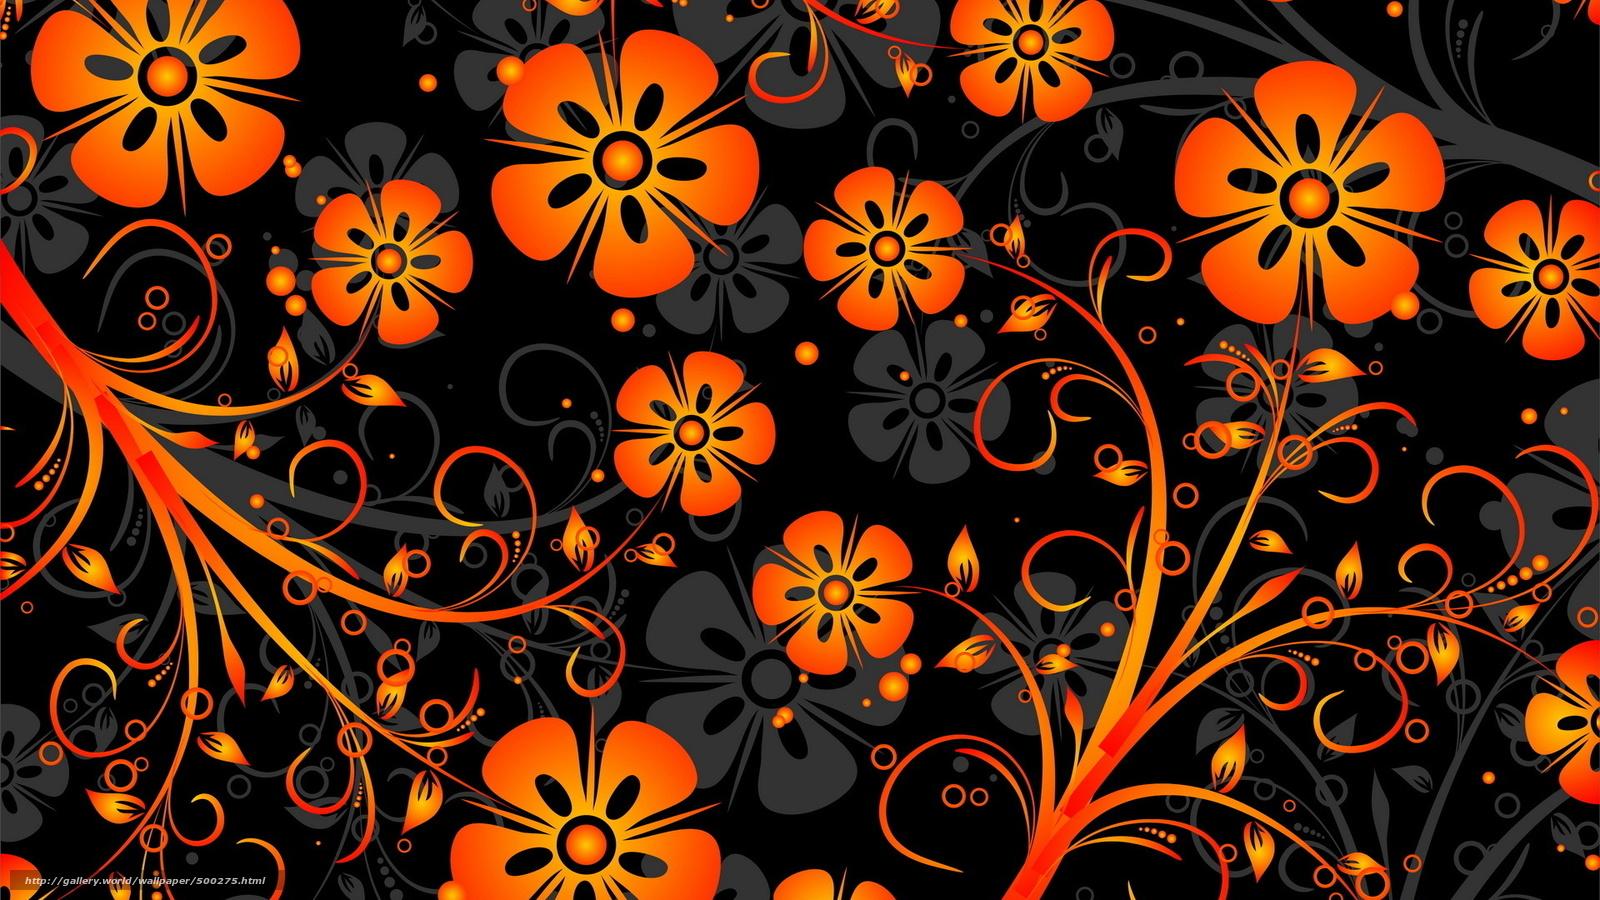 halloween orange and black wallpaper - photo #21